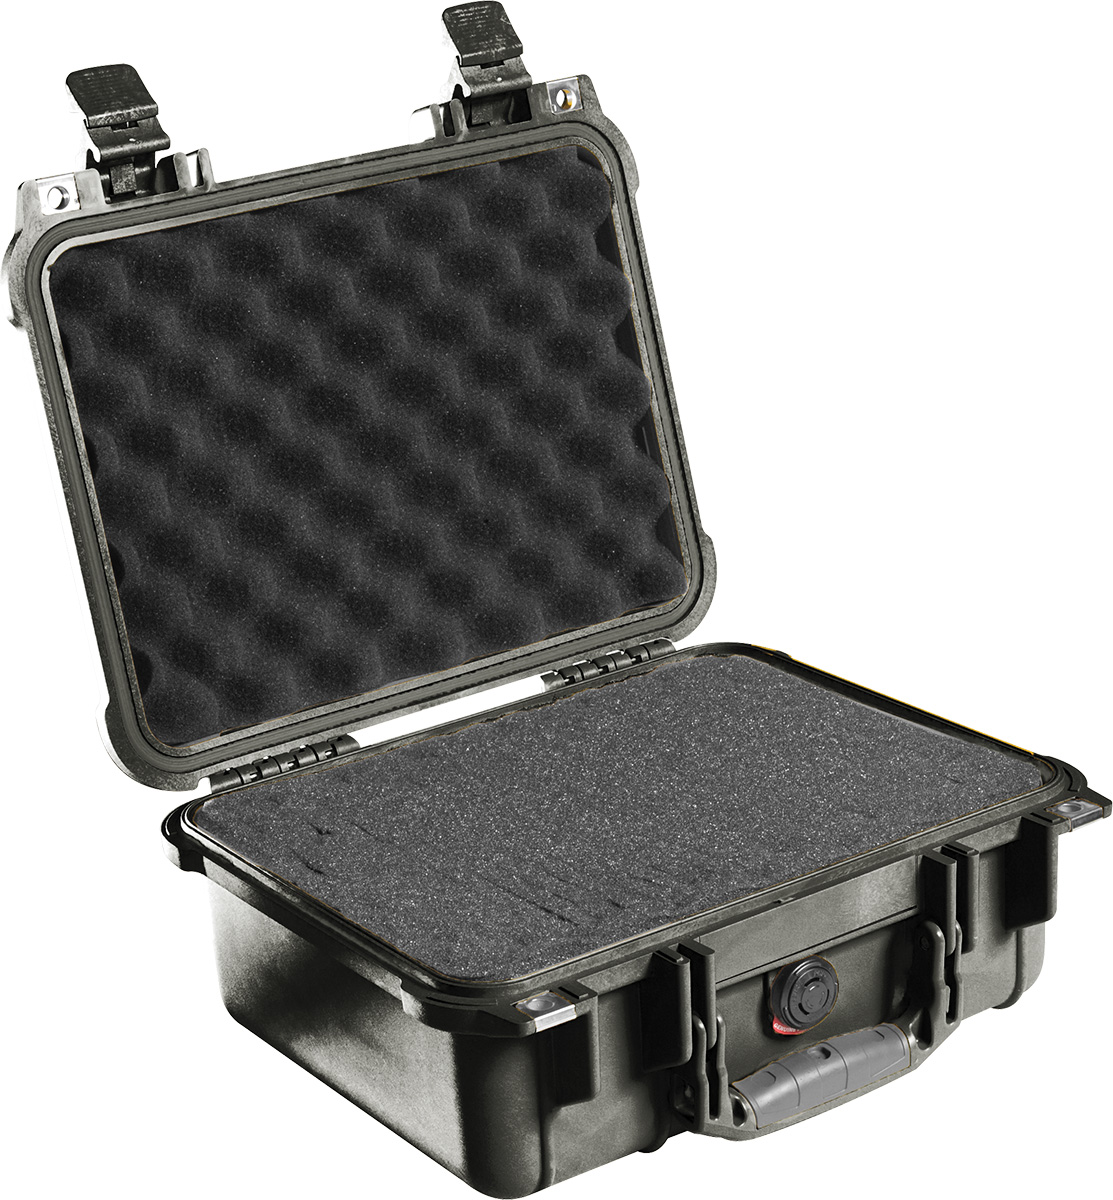 pelican 1400 hard laptop case waterproof